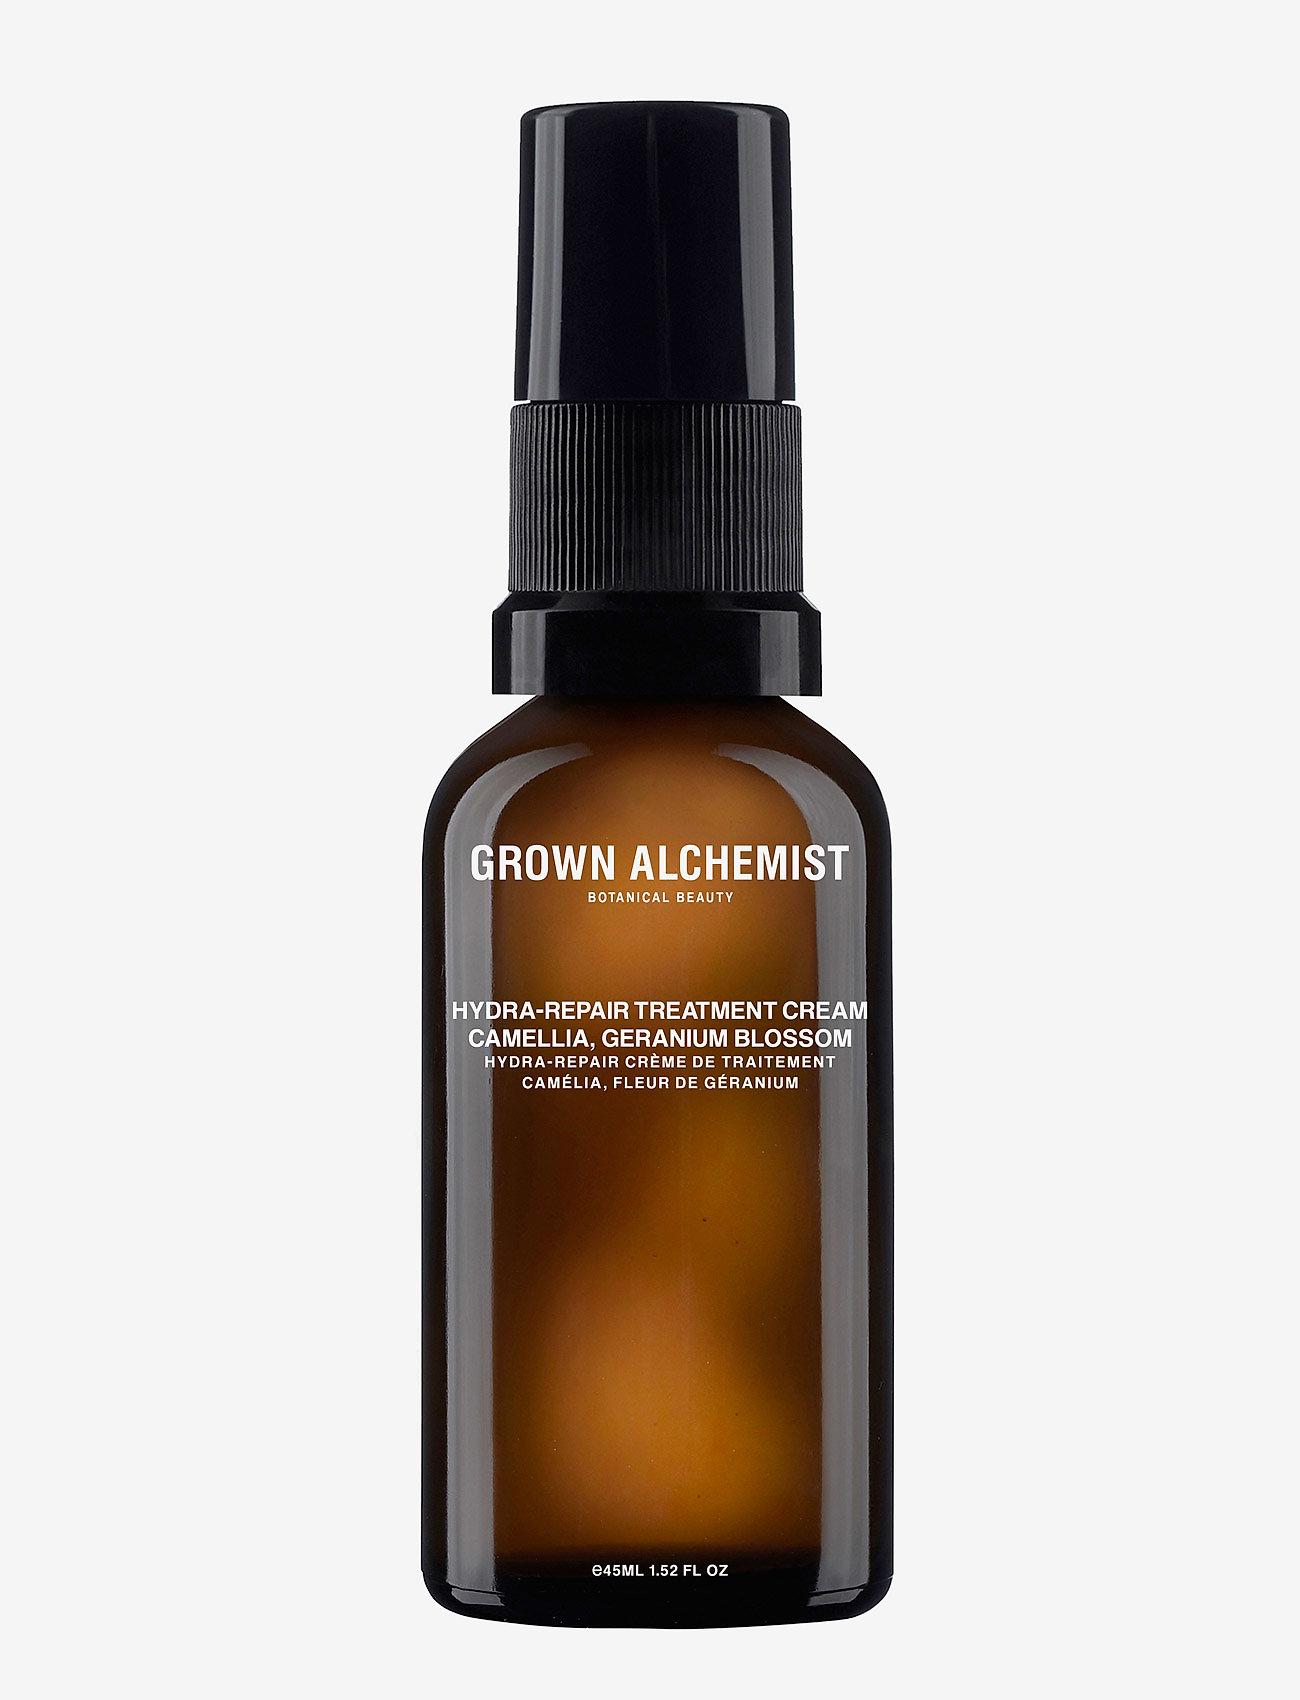 Grown Alchemist - Hydra-Repair Treatment Cream: Camellia, Geranium Blossom - dagkrem - clear - 0